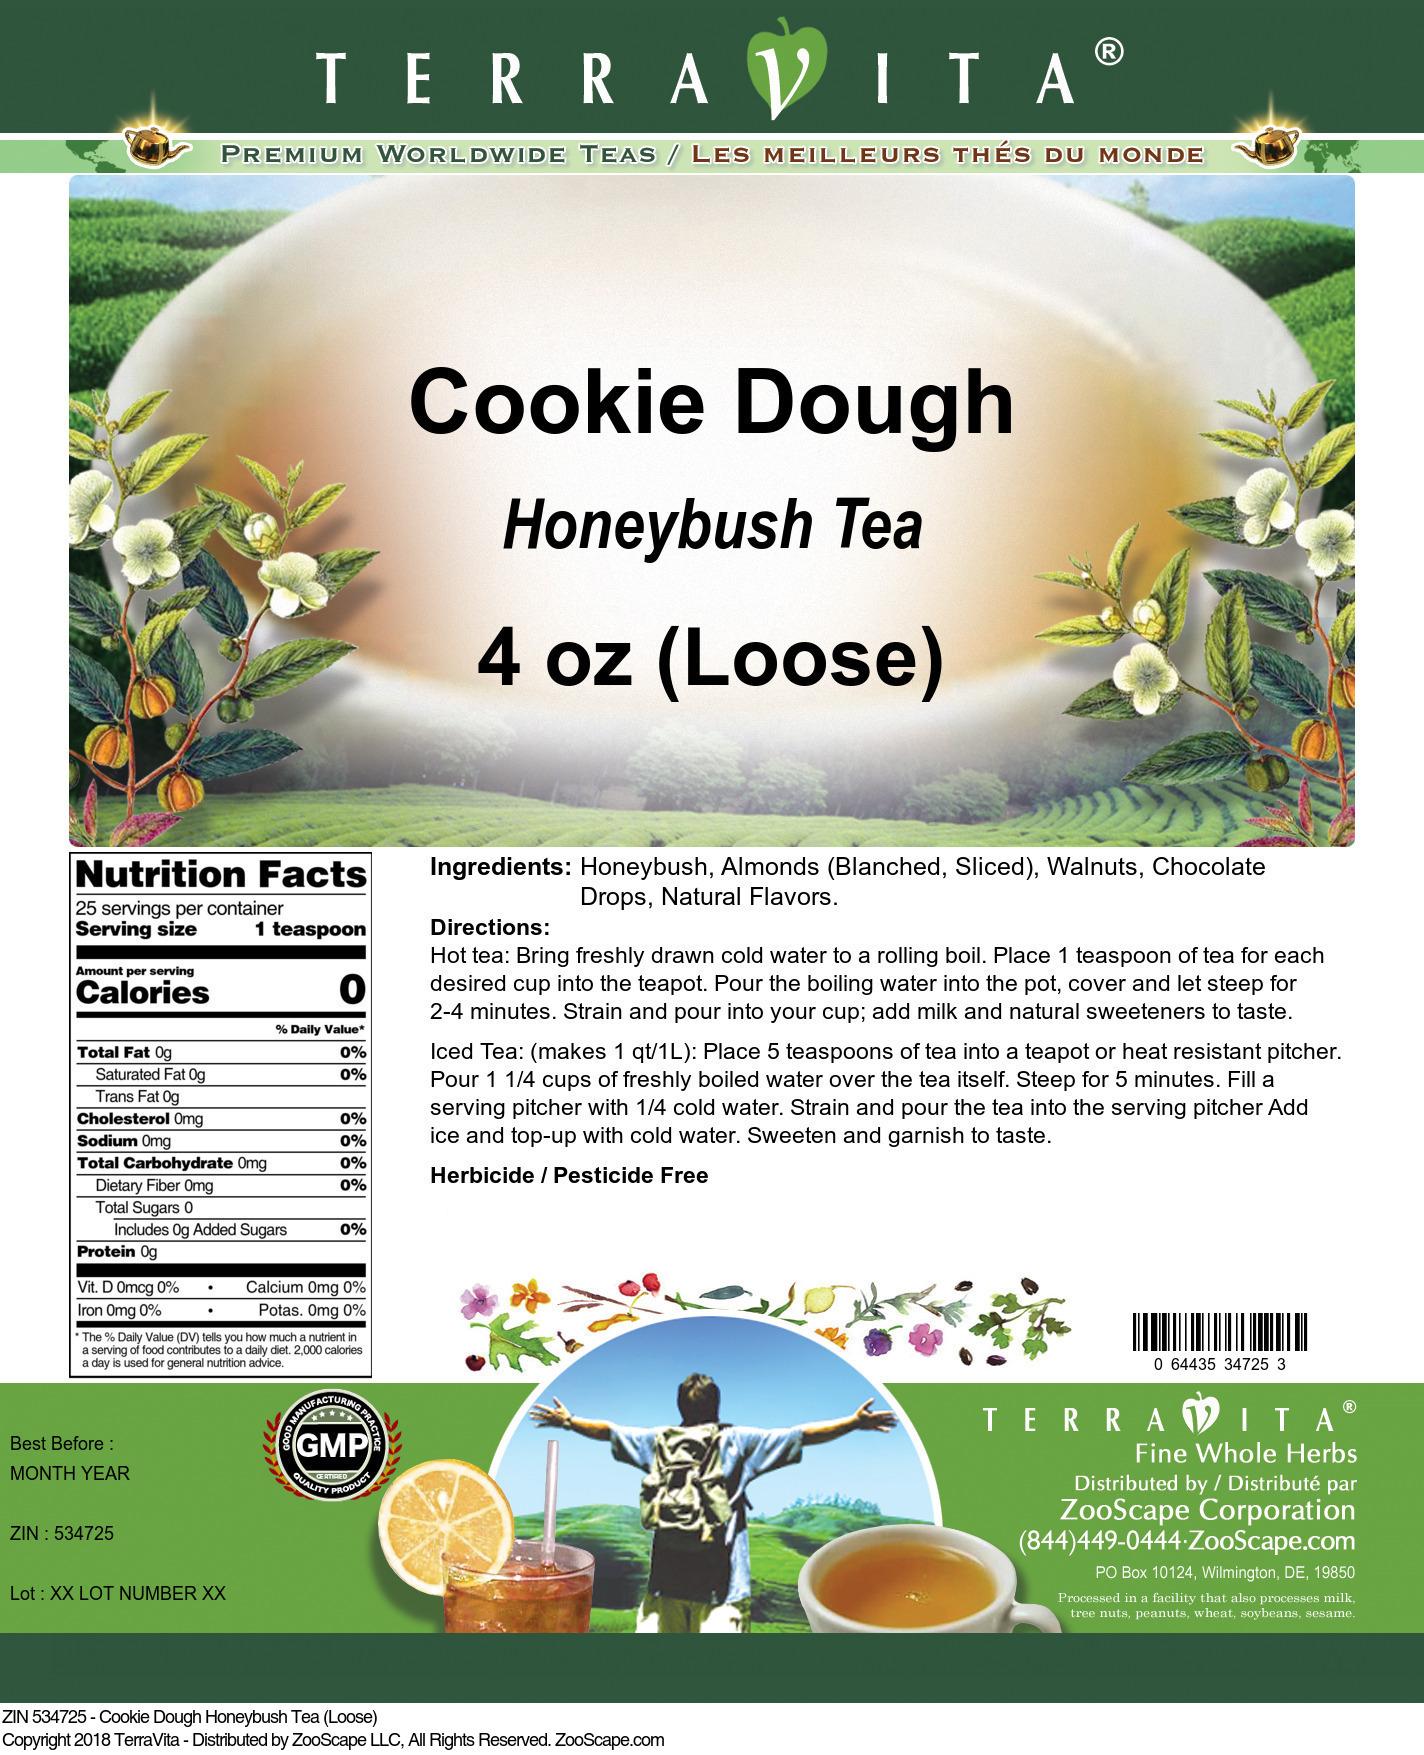 Cookie Dough Honeybush Tea (Loose)